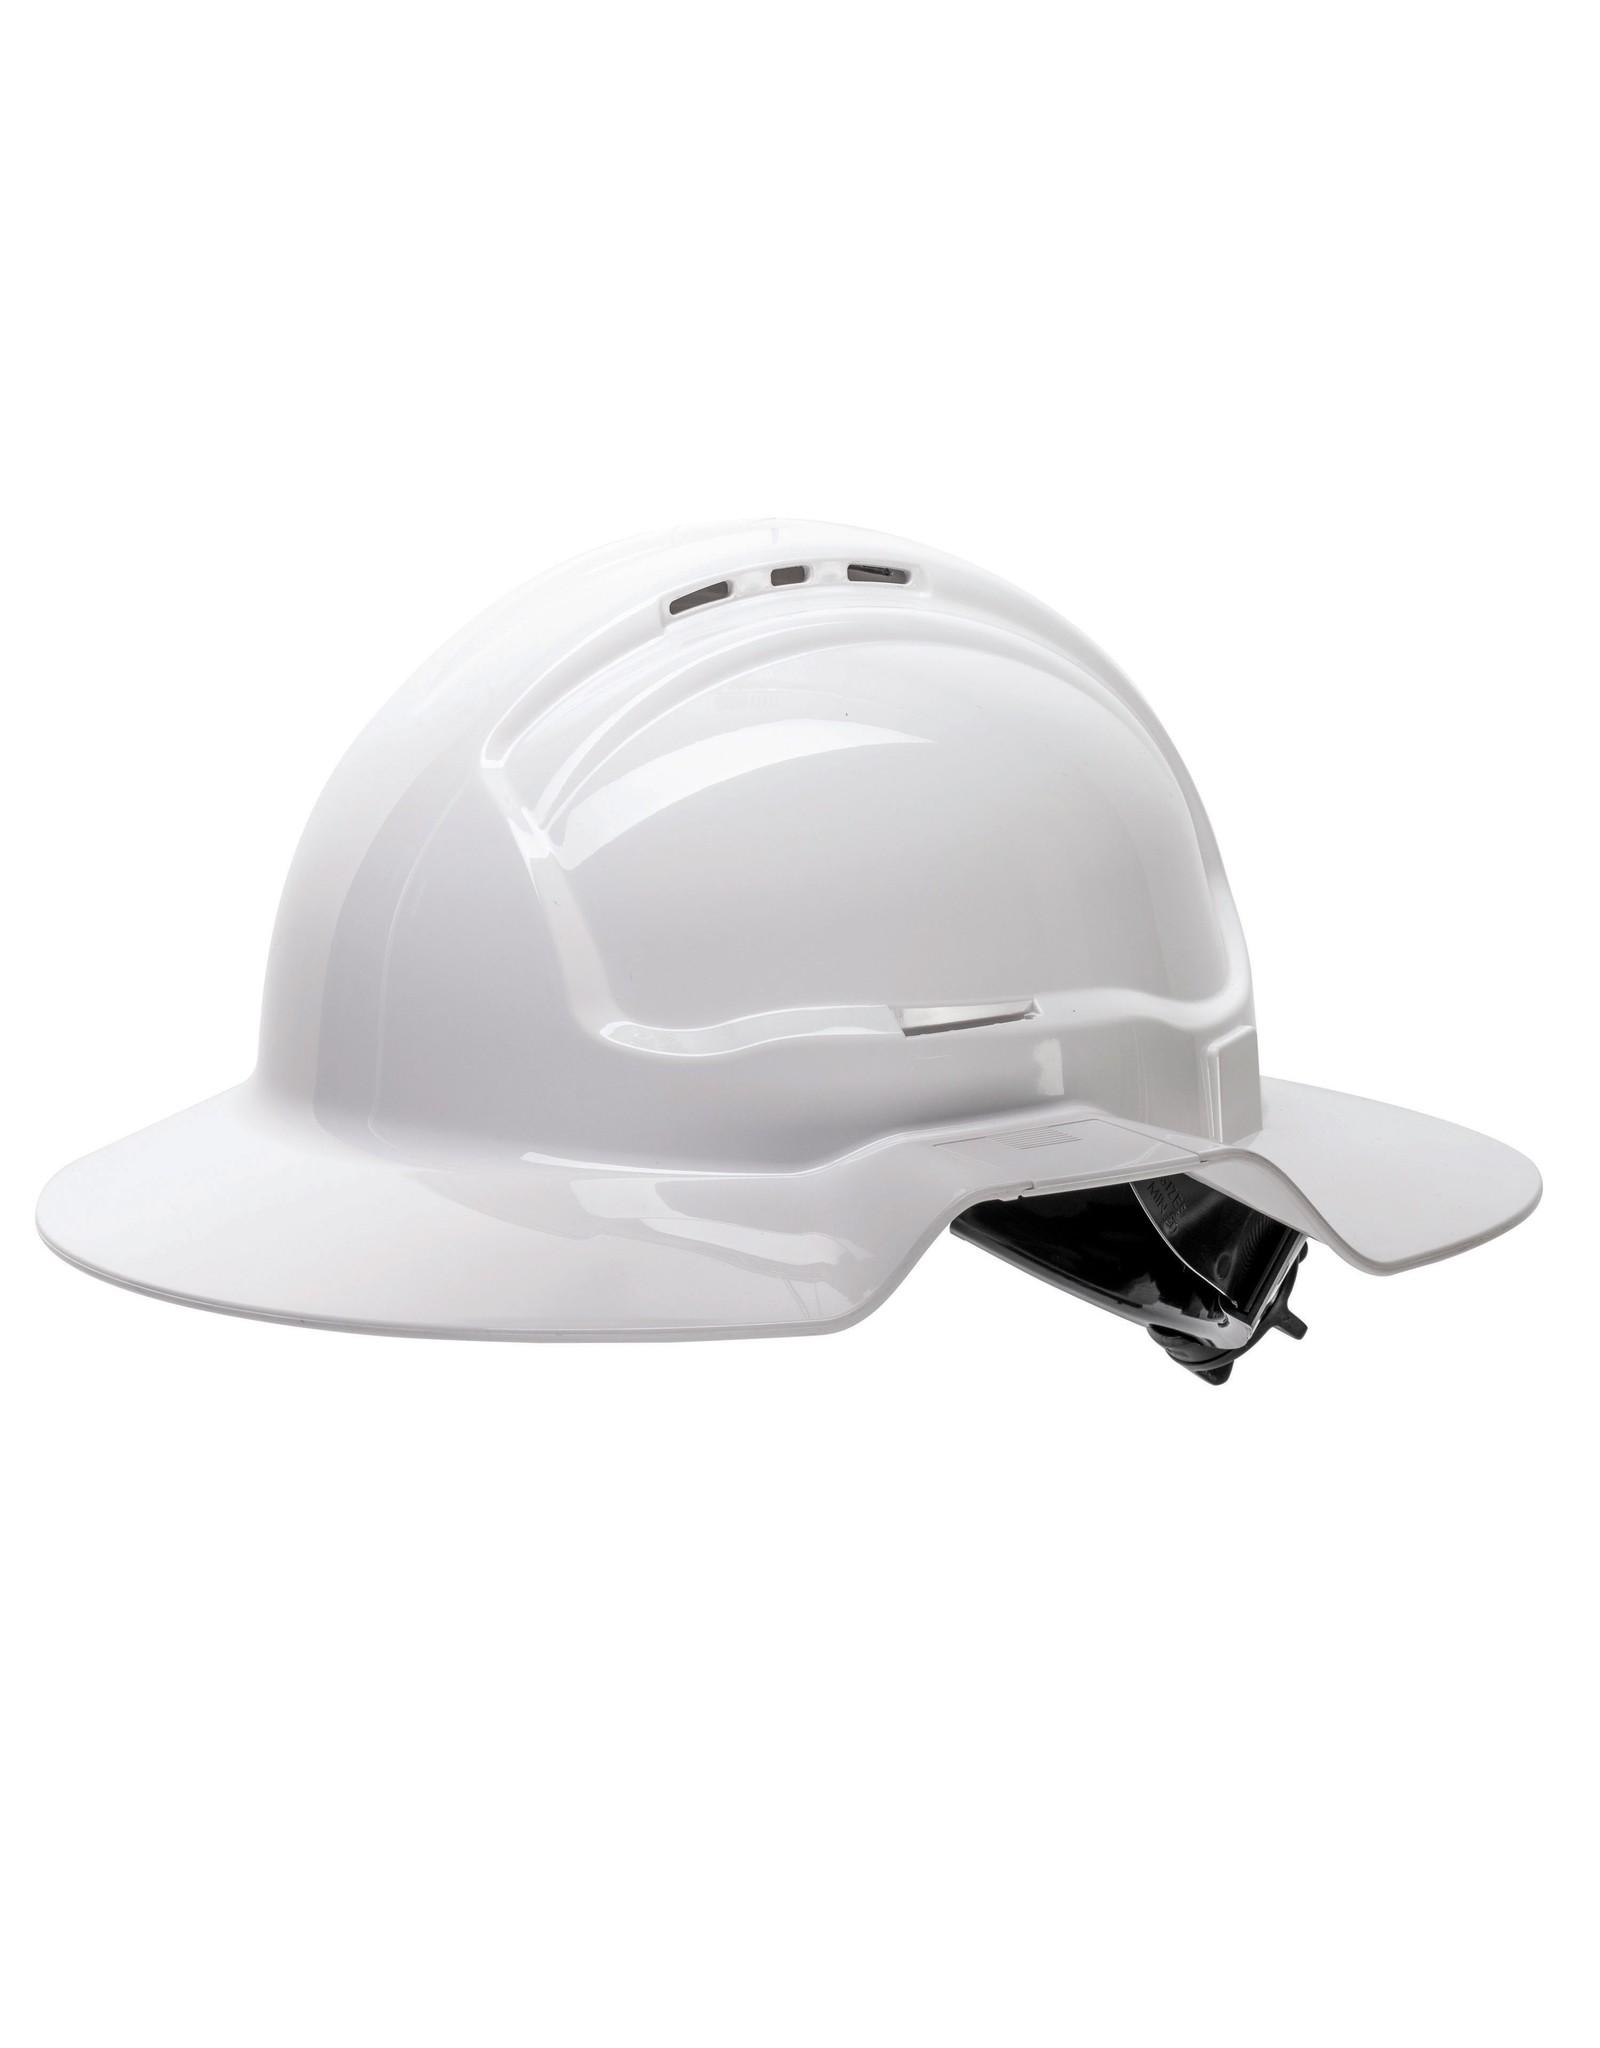 Force360 Force360 Type 1 Broad Brim Vented Hard Hat